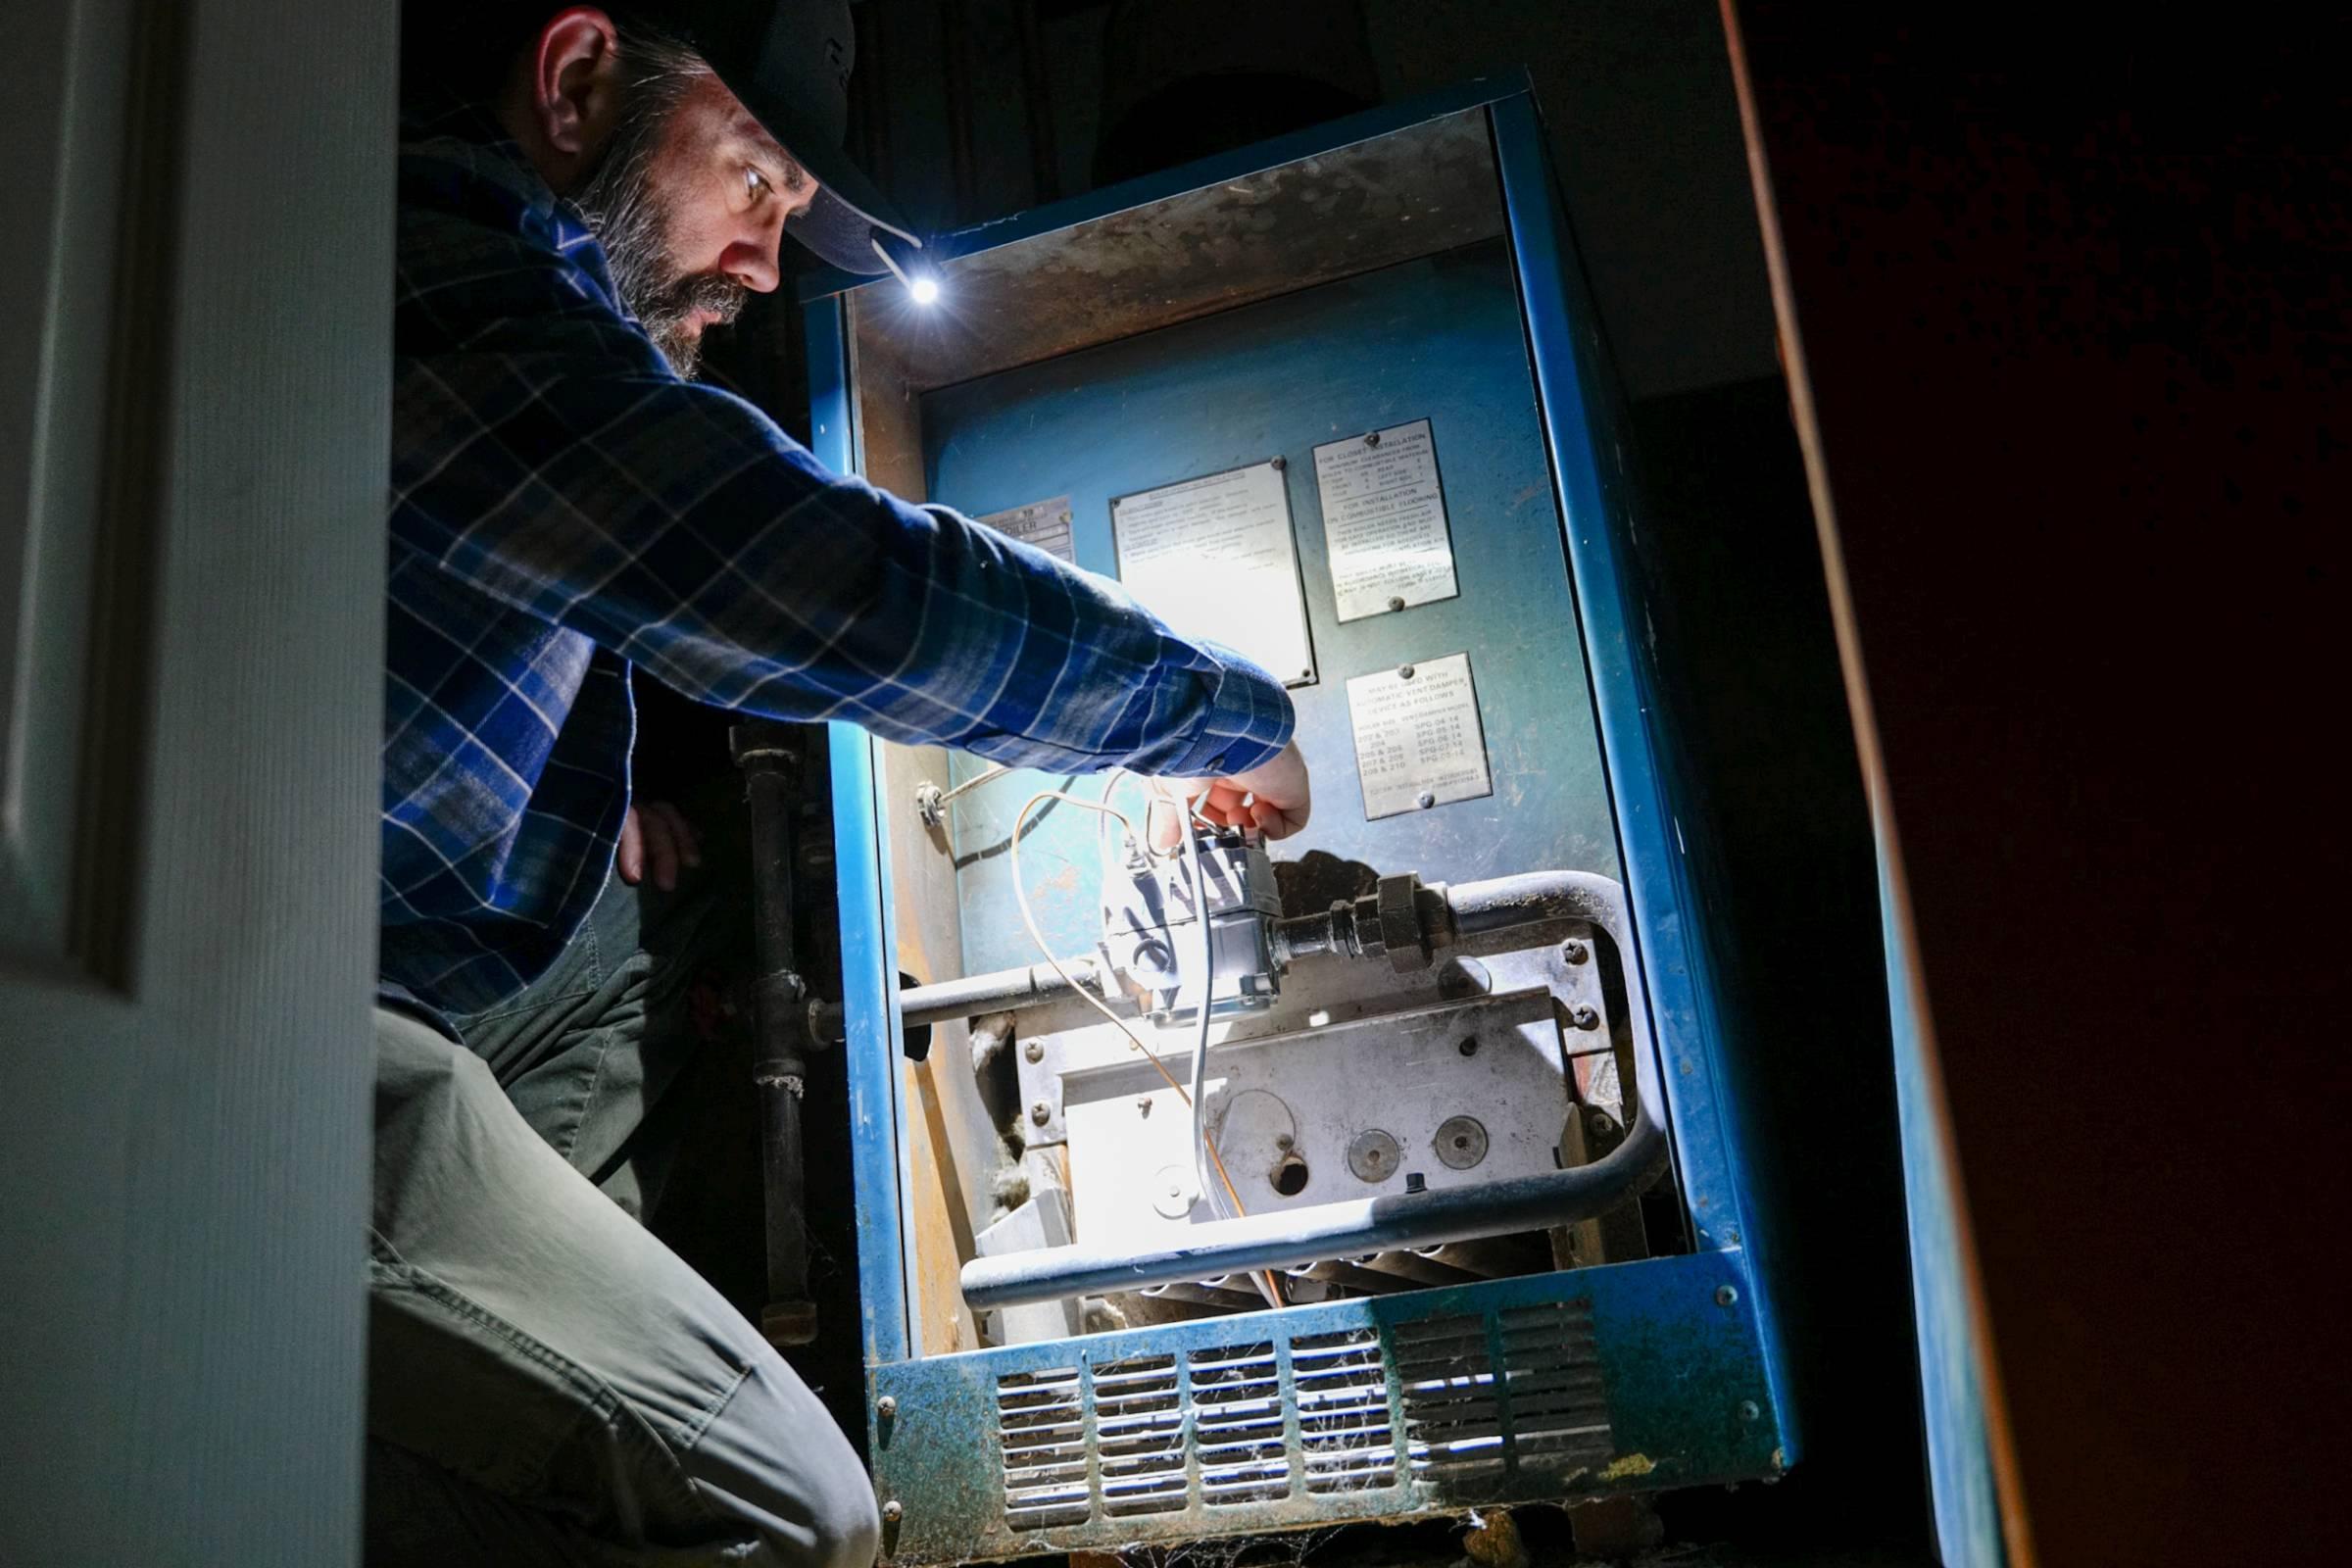 Fenix E-Lite EDC lighting up furnace